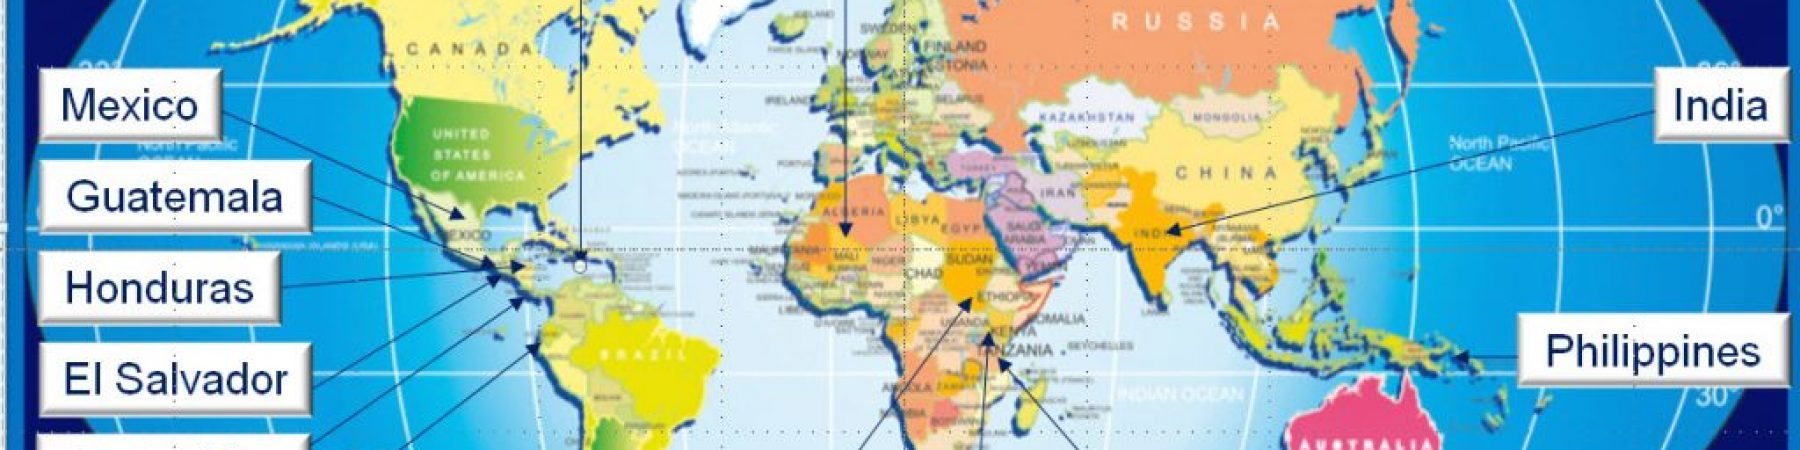 Grant_Map